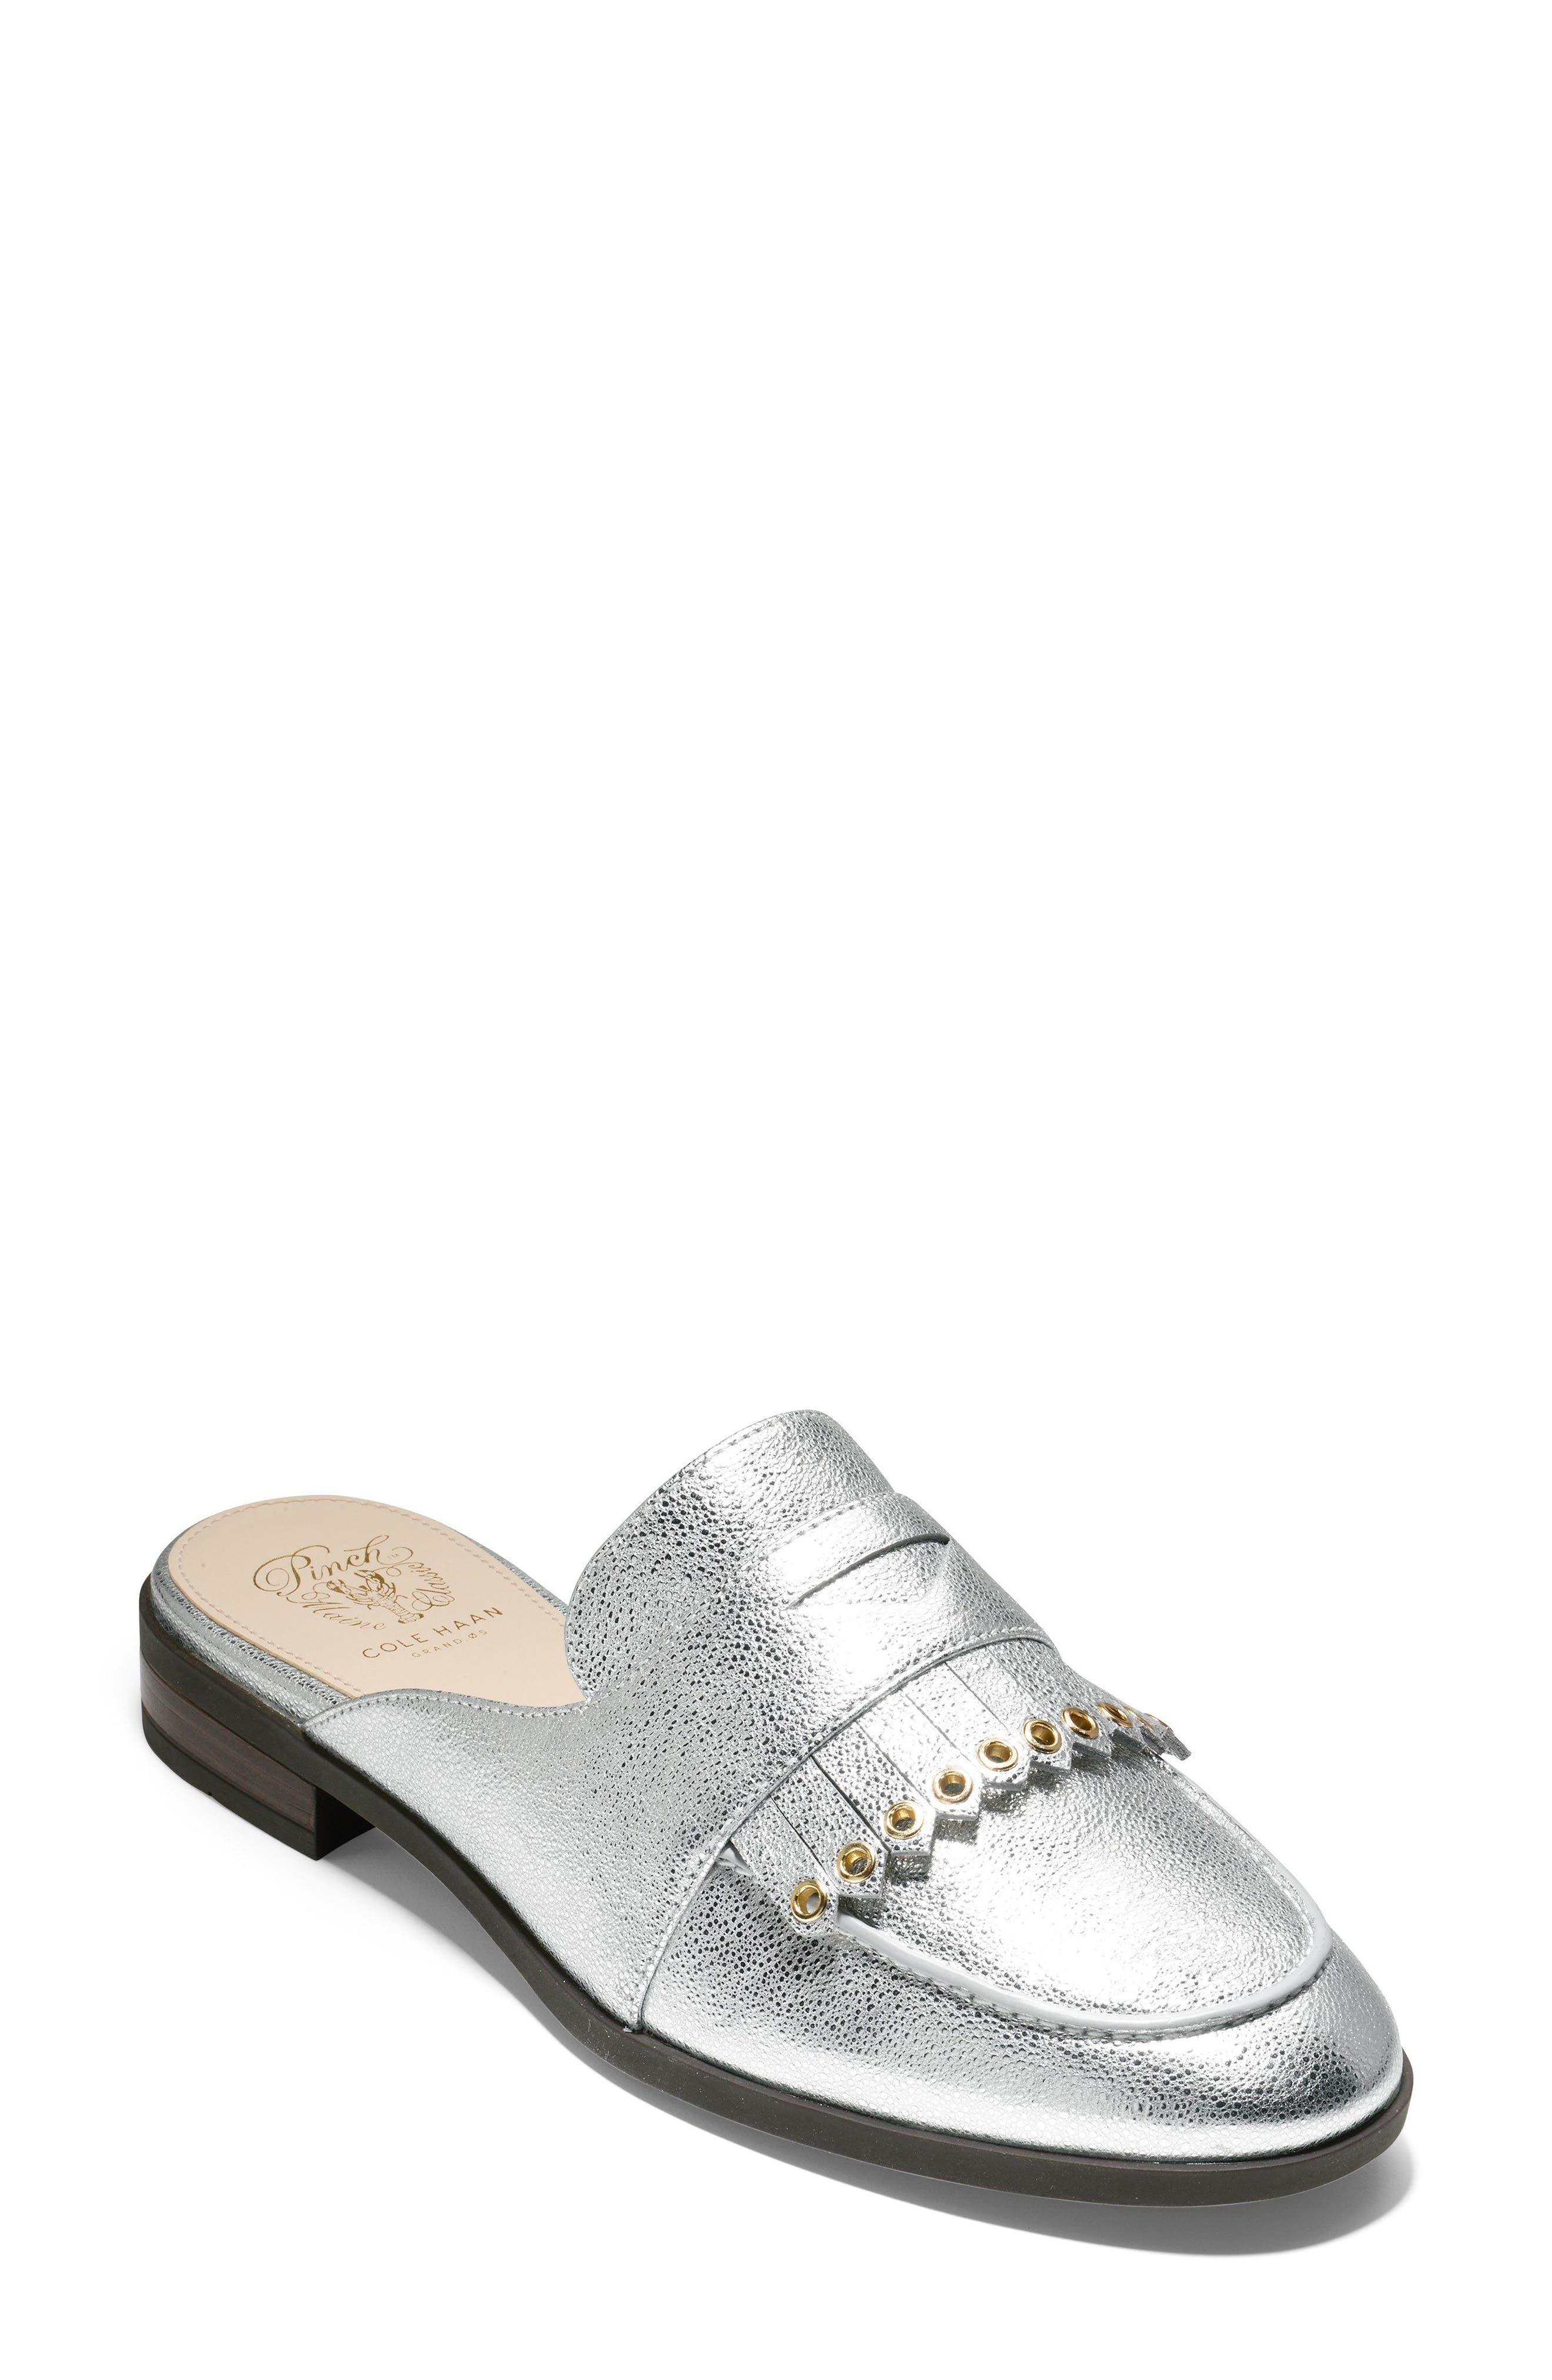 Pinch Kiltie Mule,                         Main,                         color, Silver Leather